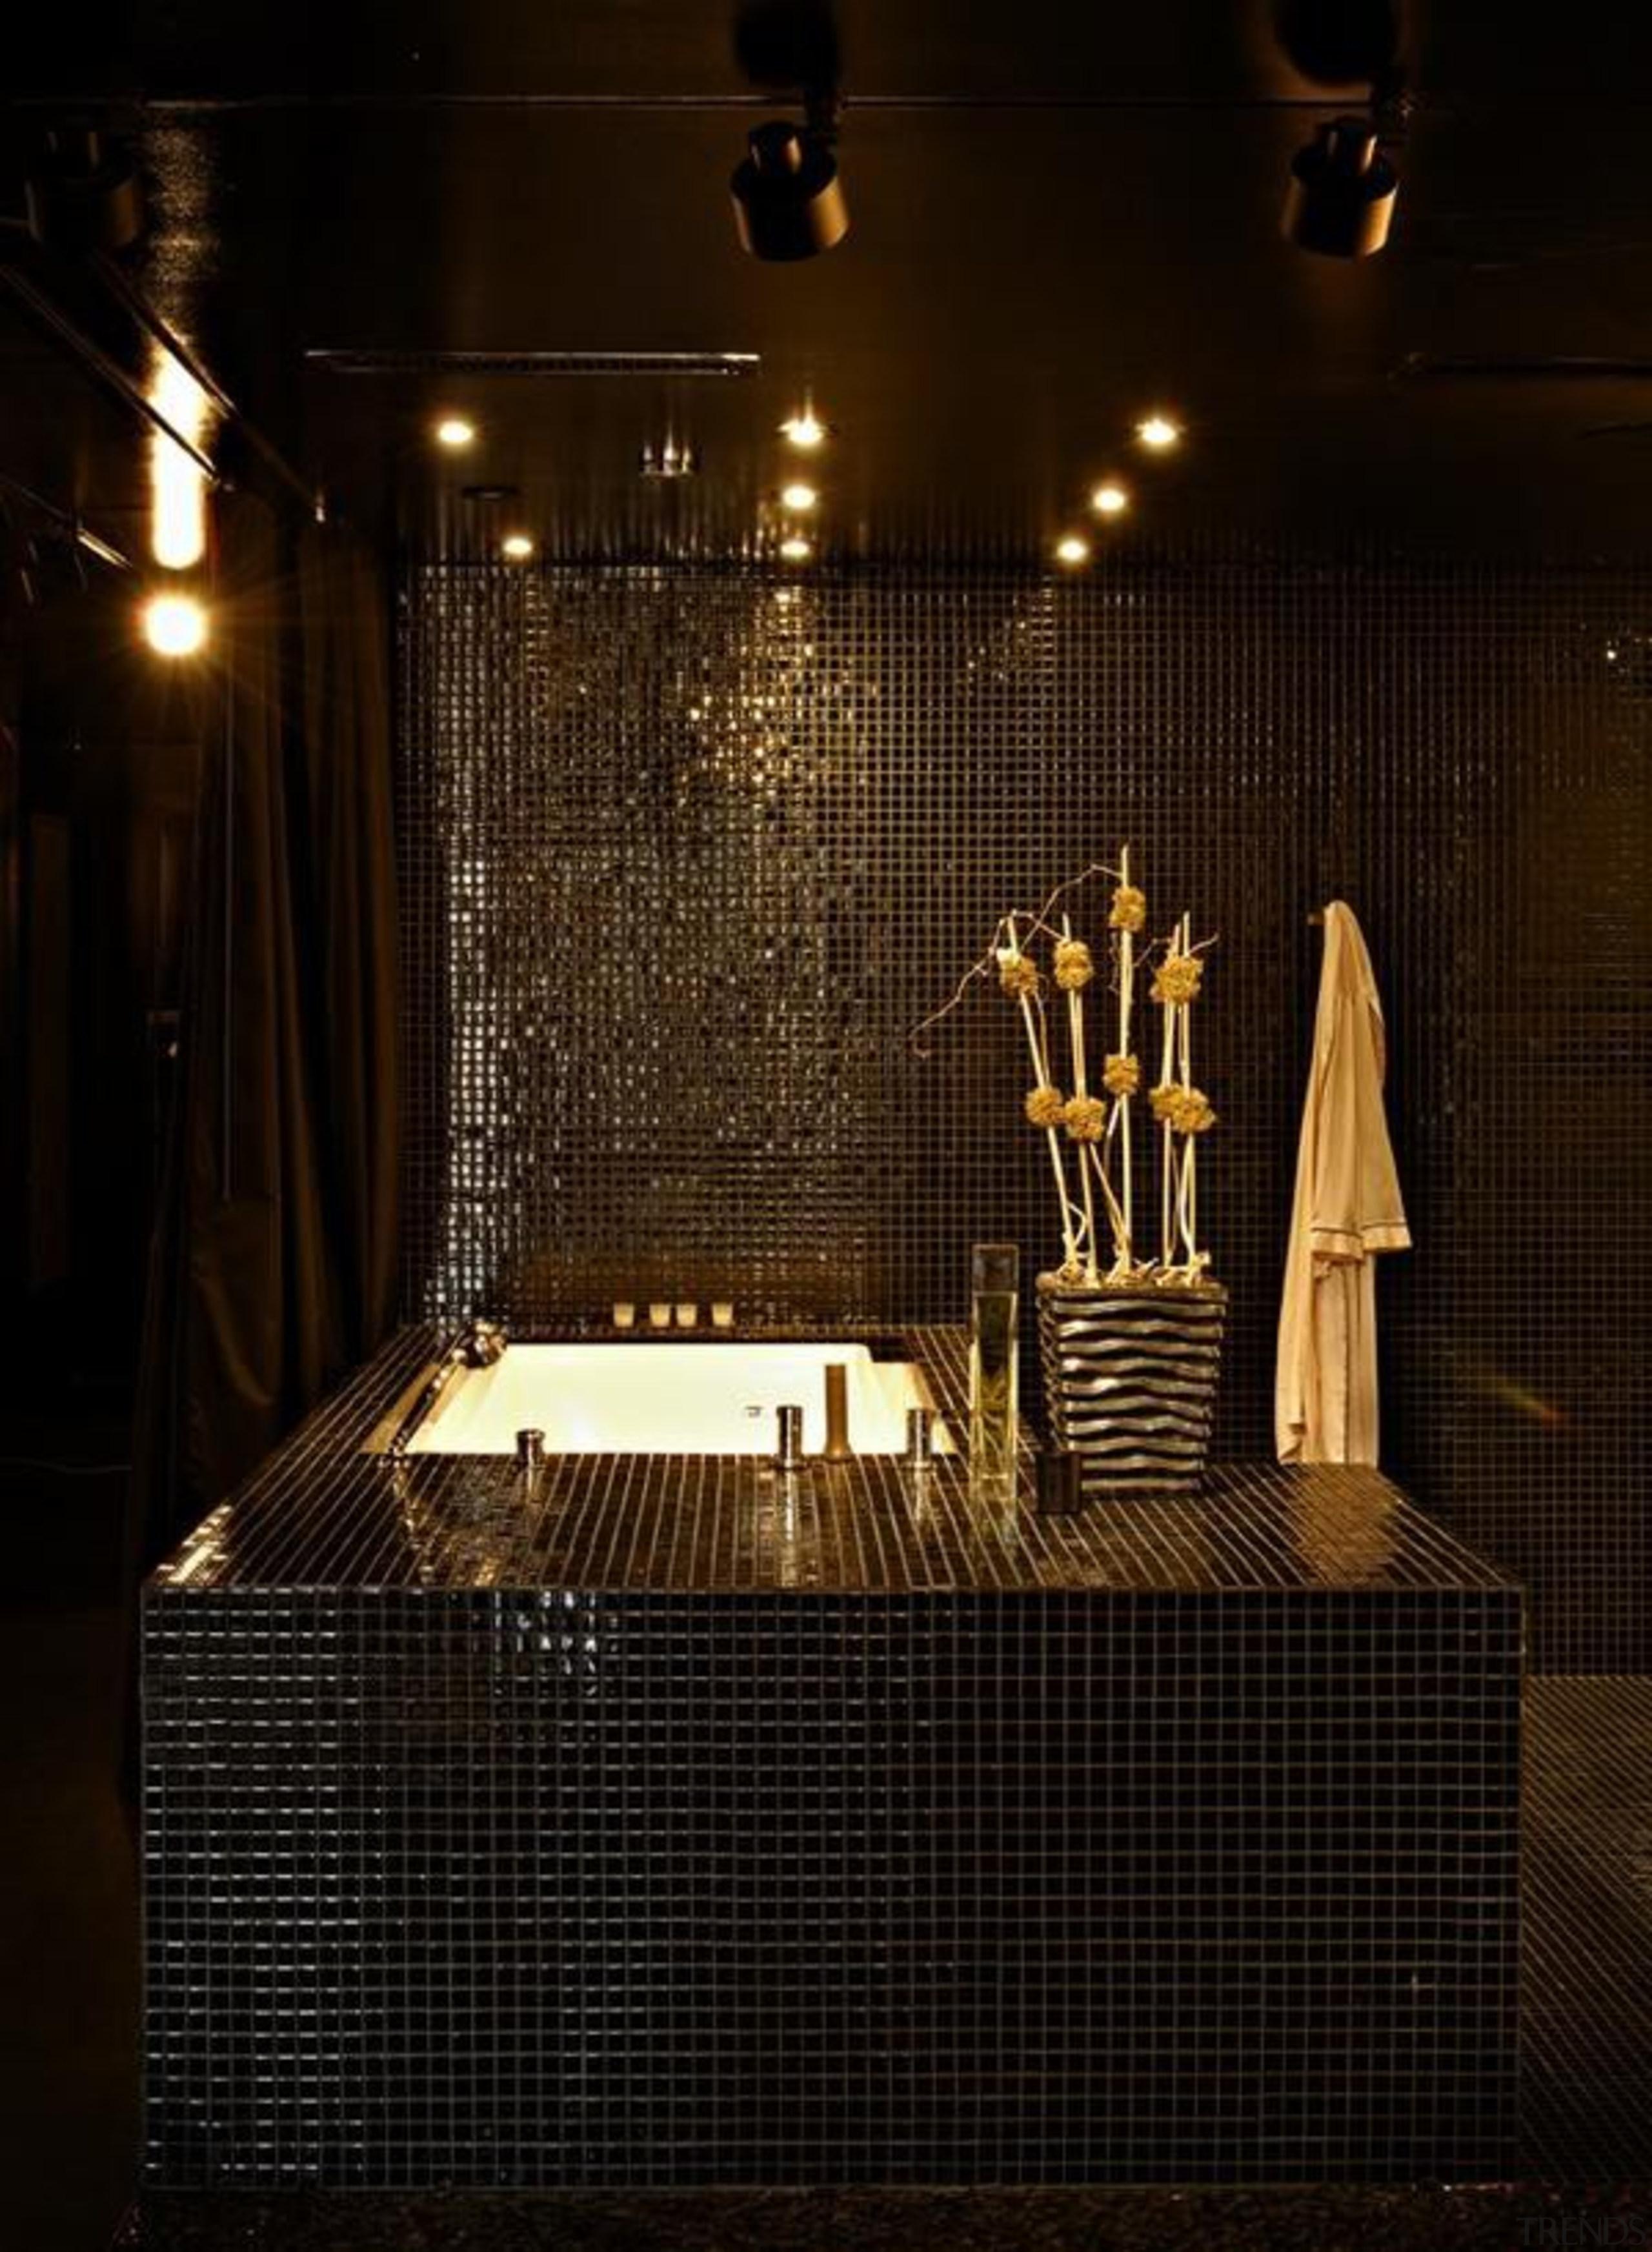 Creating Apartment like Nightclub with Almost Entirely Black darkness, interior design, light, light fixture, lighting, night, black